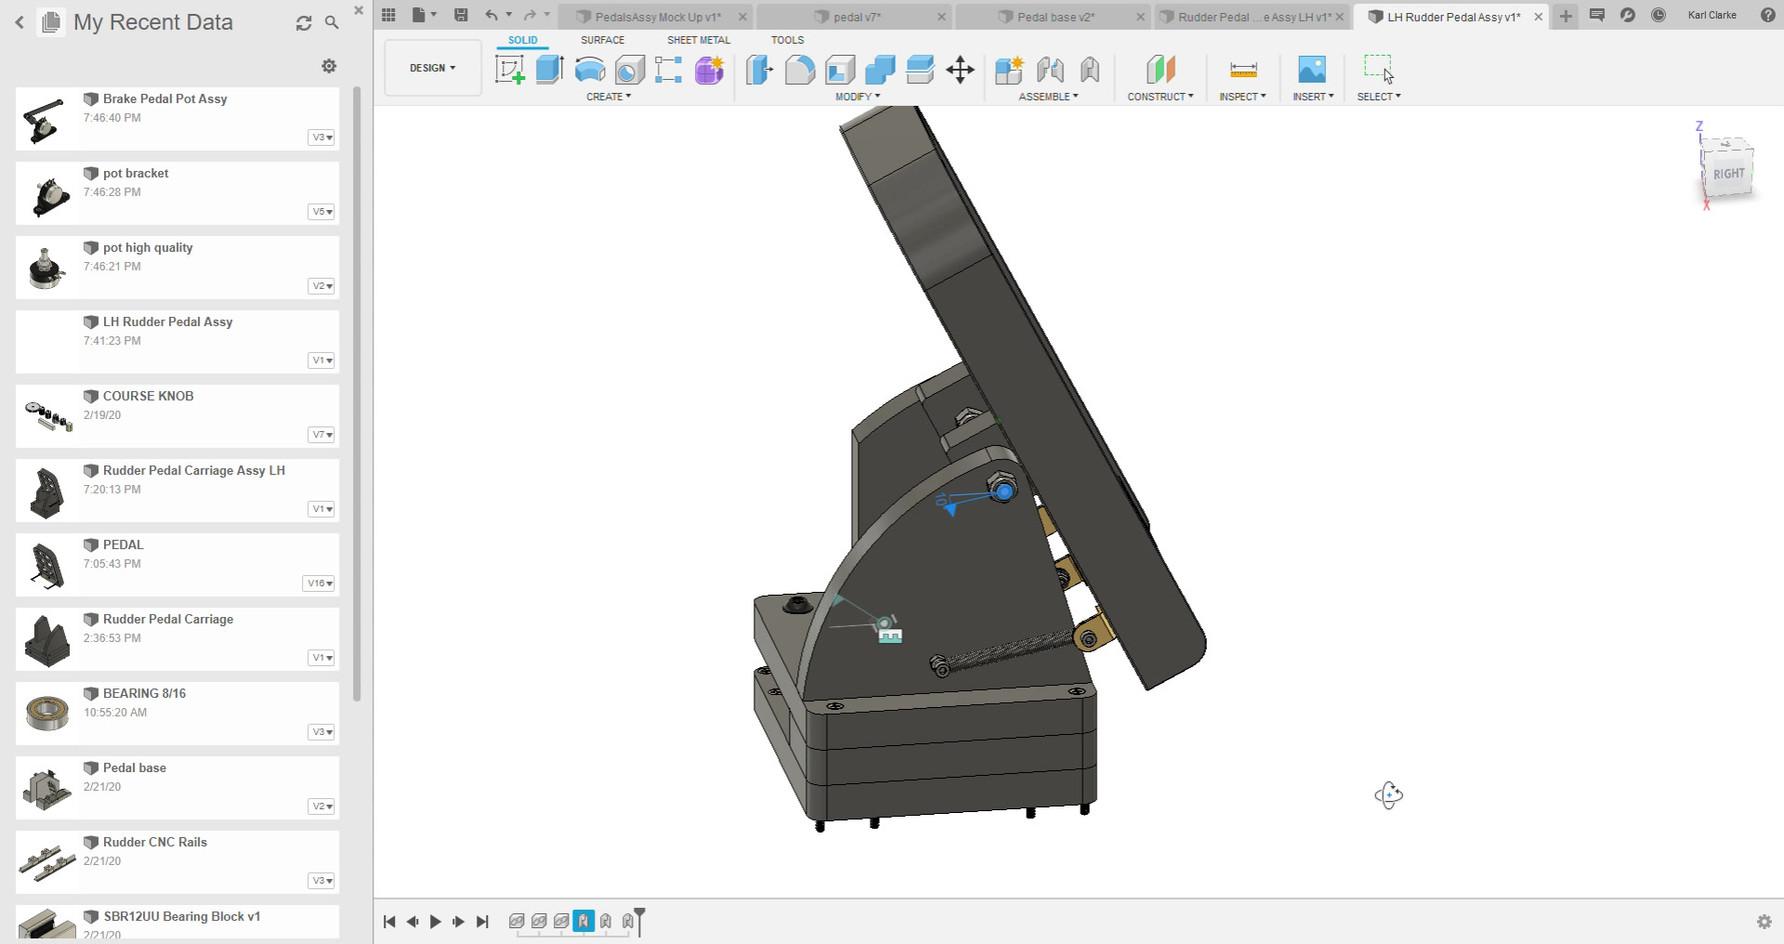 Autodesk Fusion 360 2020-02-22 19-47-44.